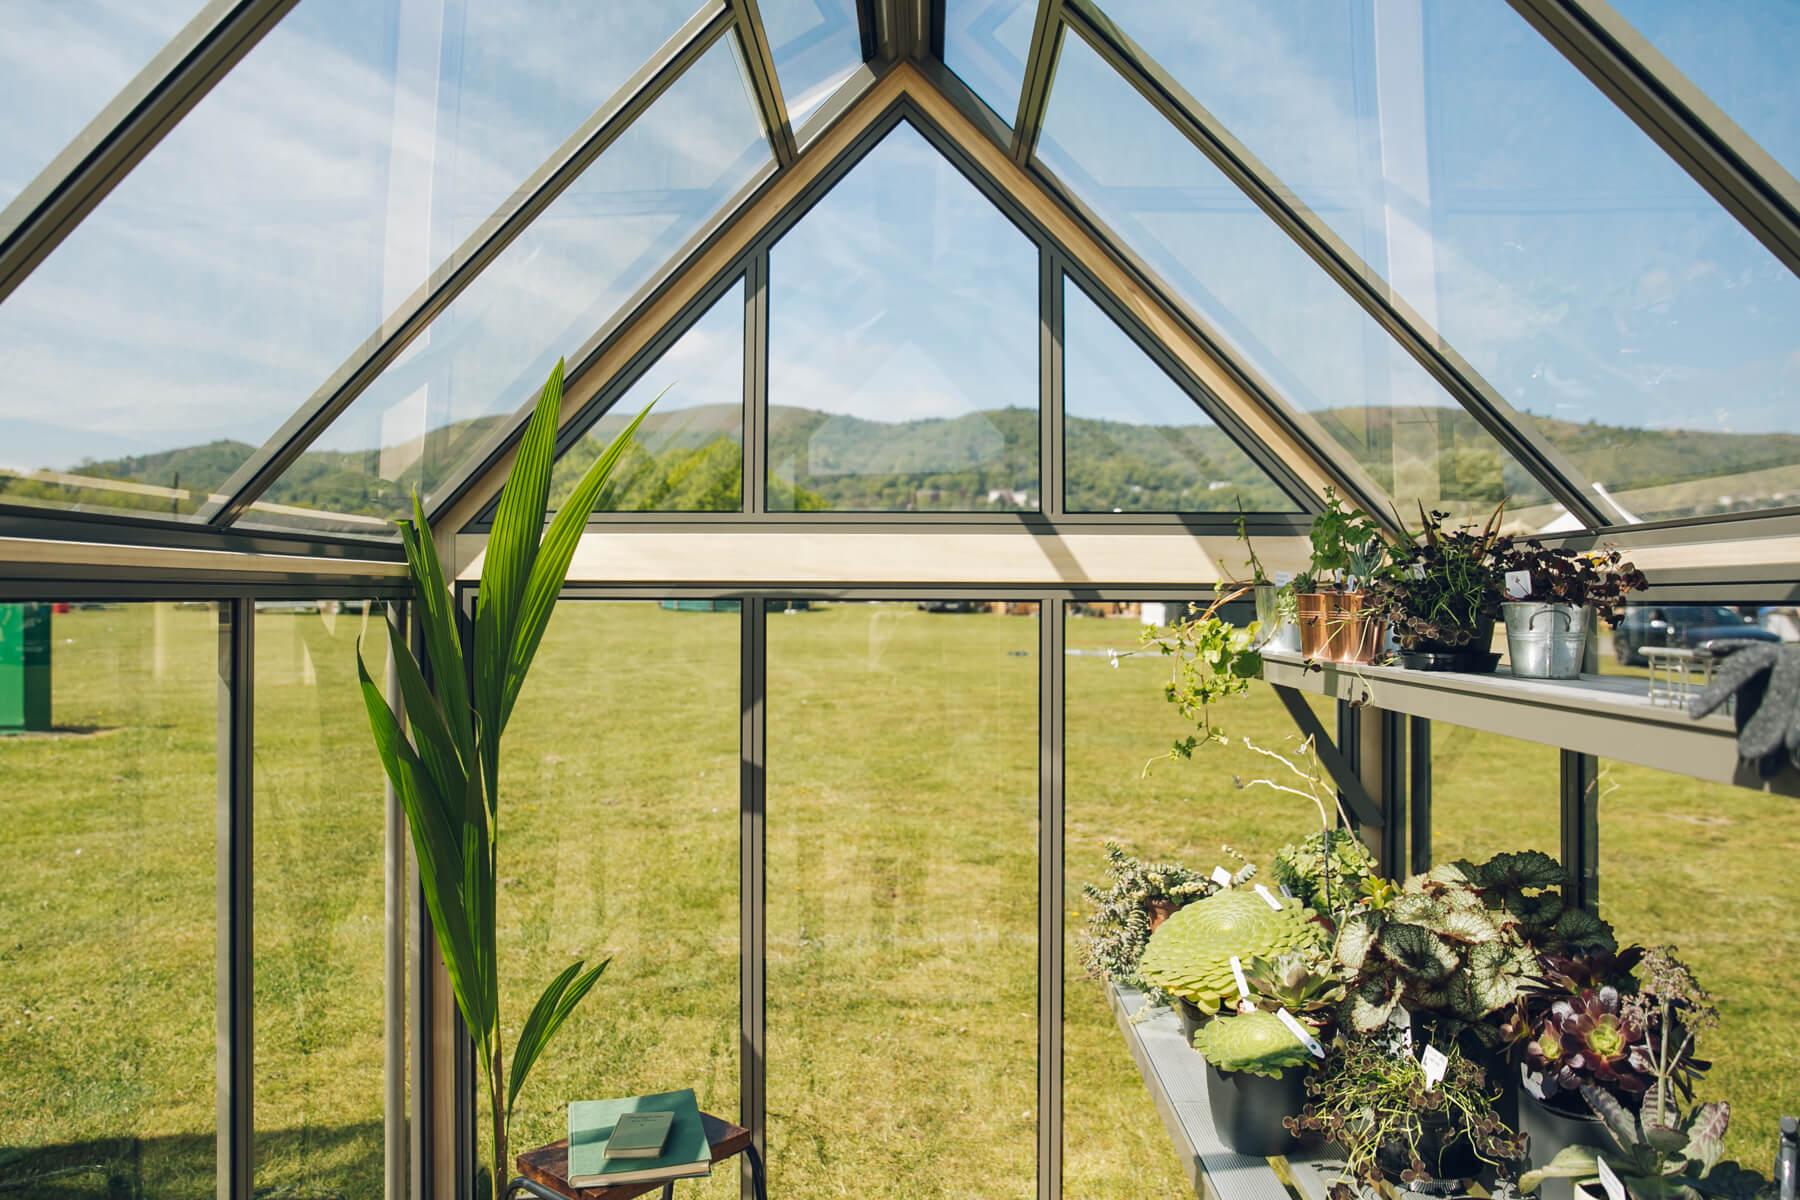 Quality Greenhouses UK